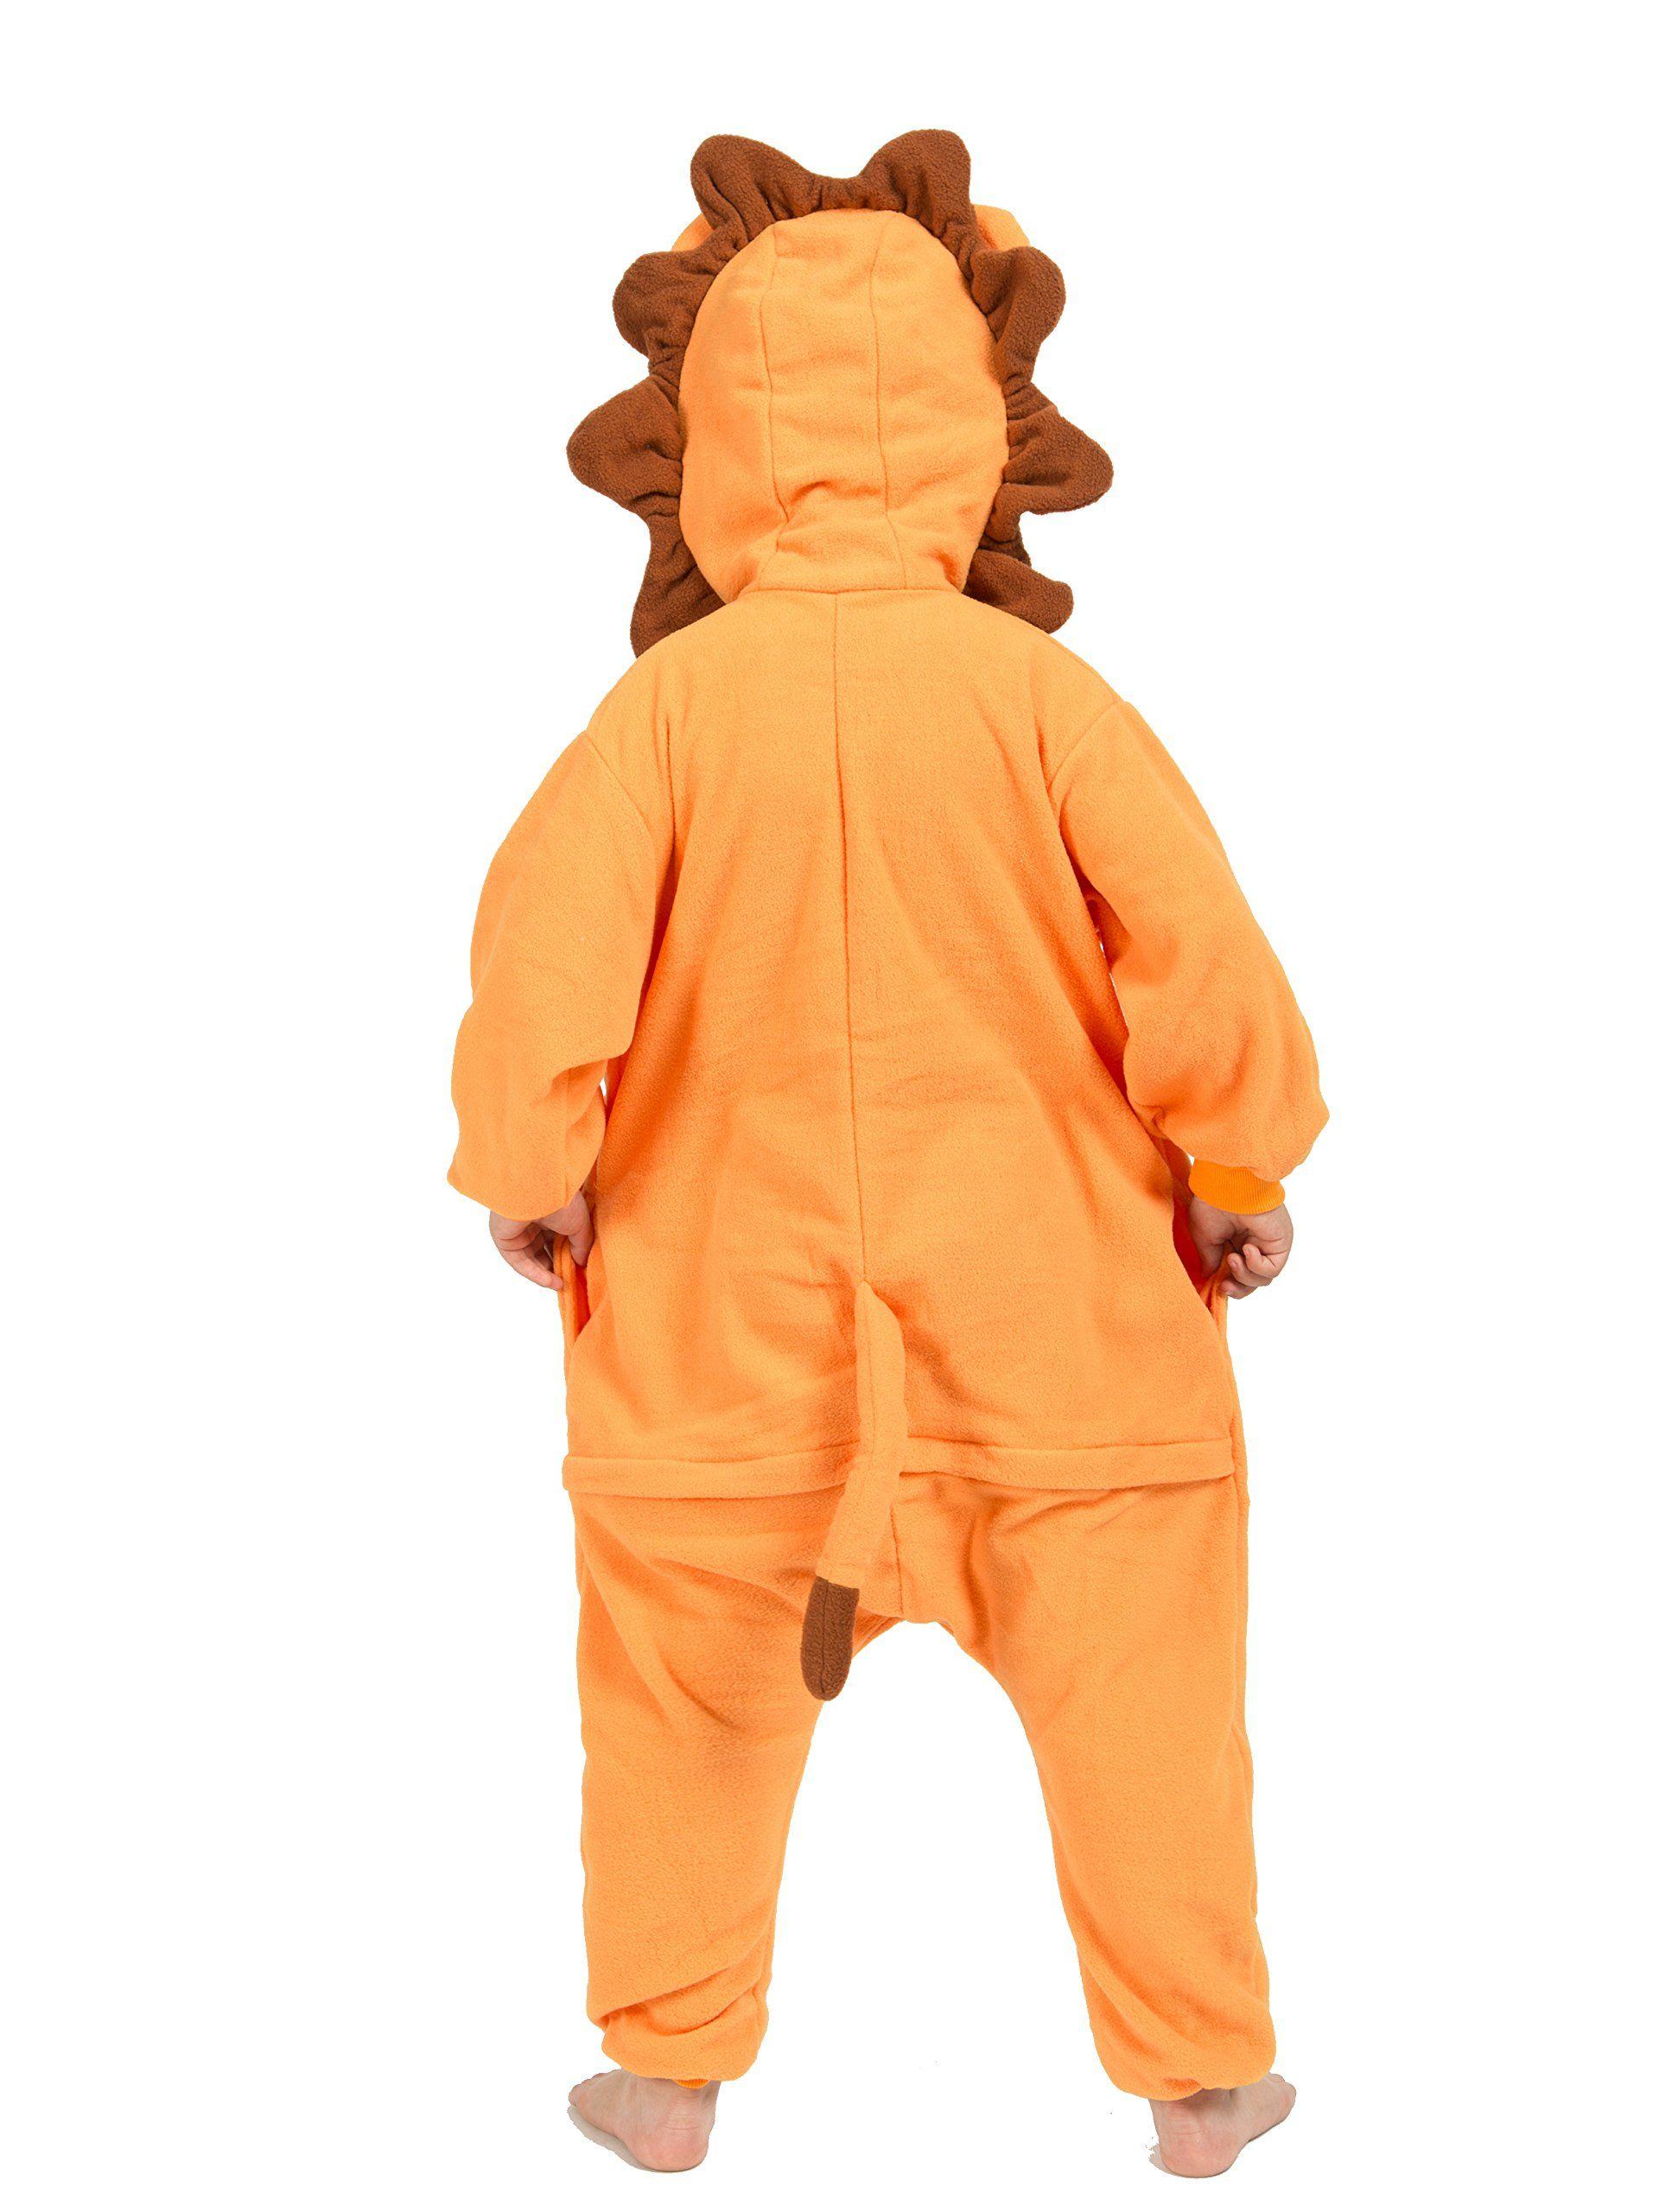 BELIFECOS Childrens Lion Costumes Animal Onesies Kids Homewear Pajamas